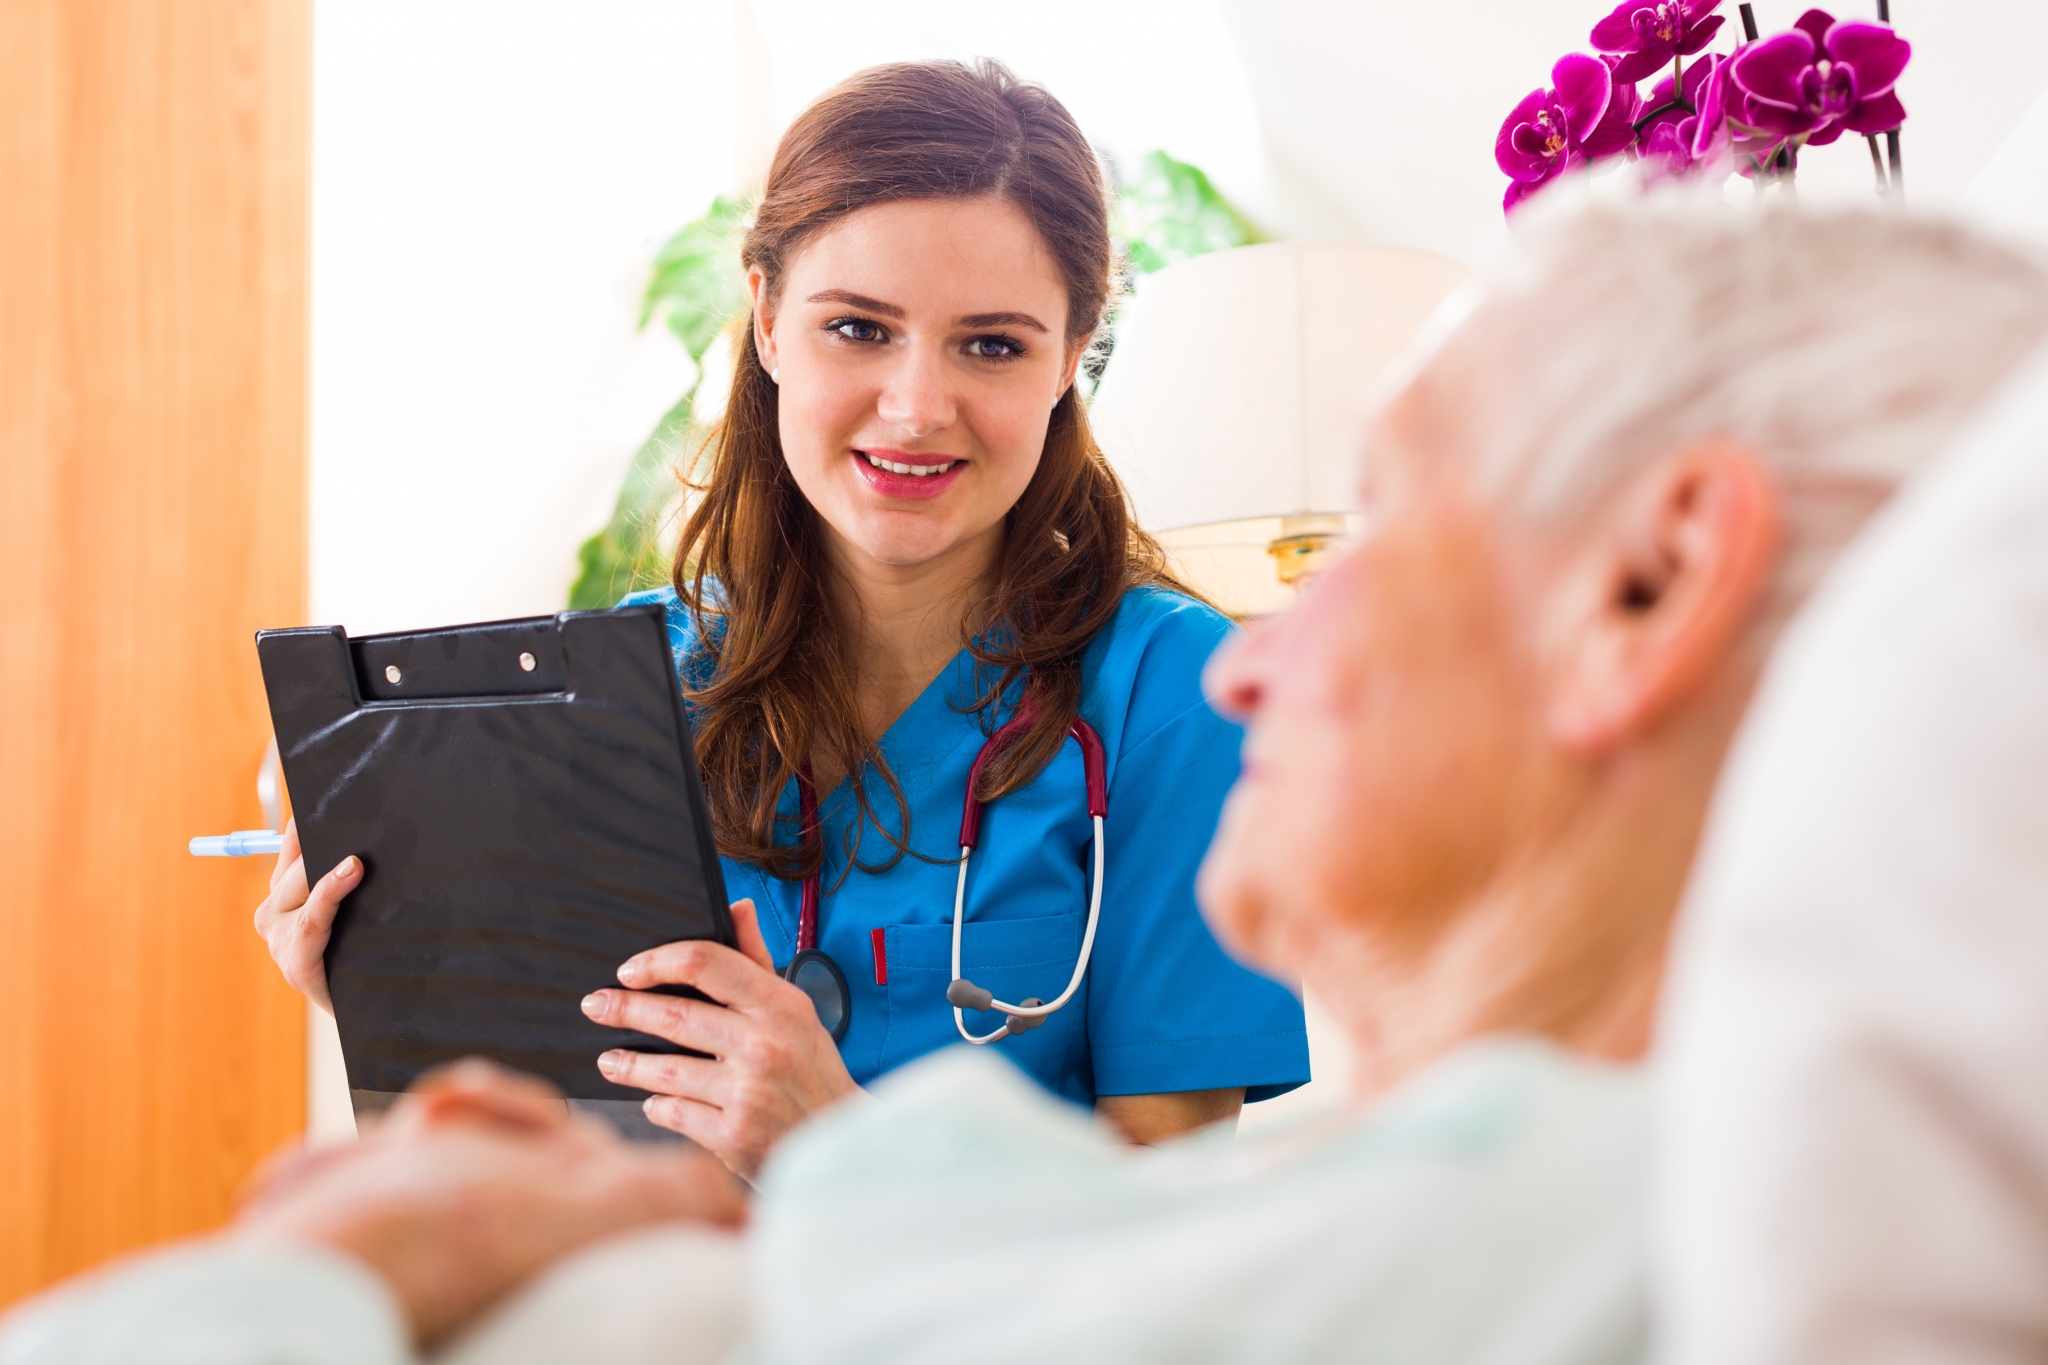 Registered Nurse smiling at a patient